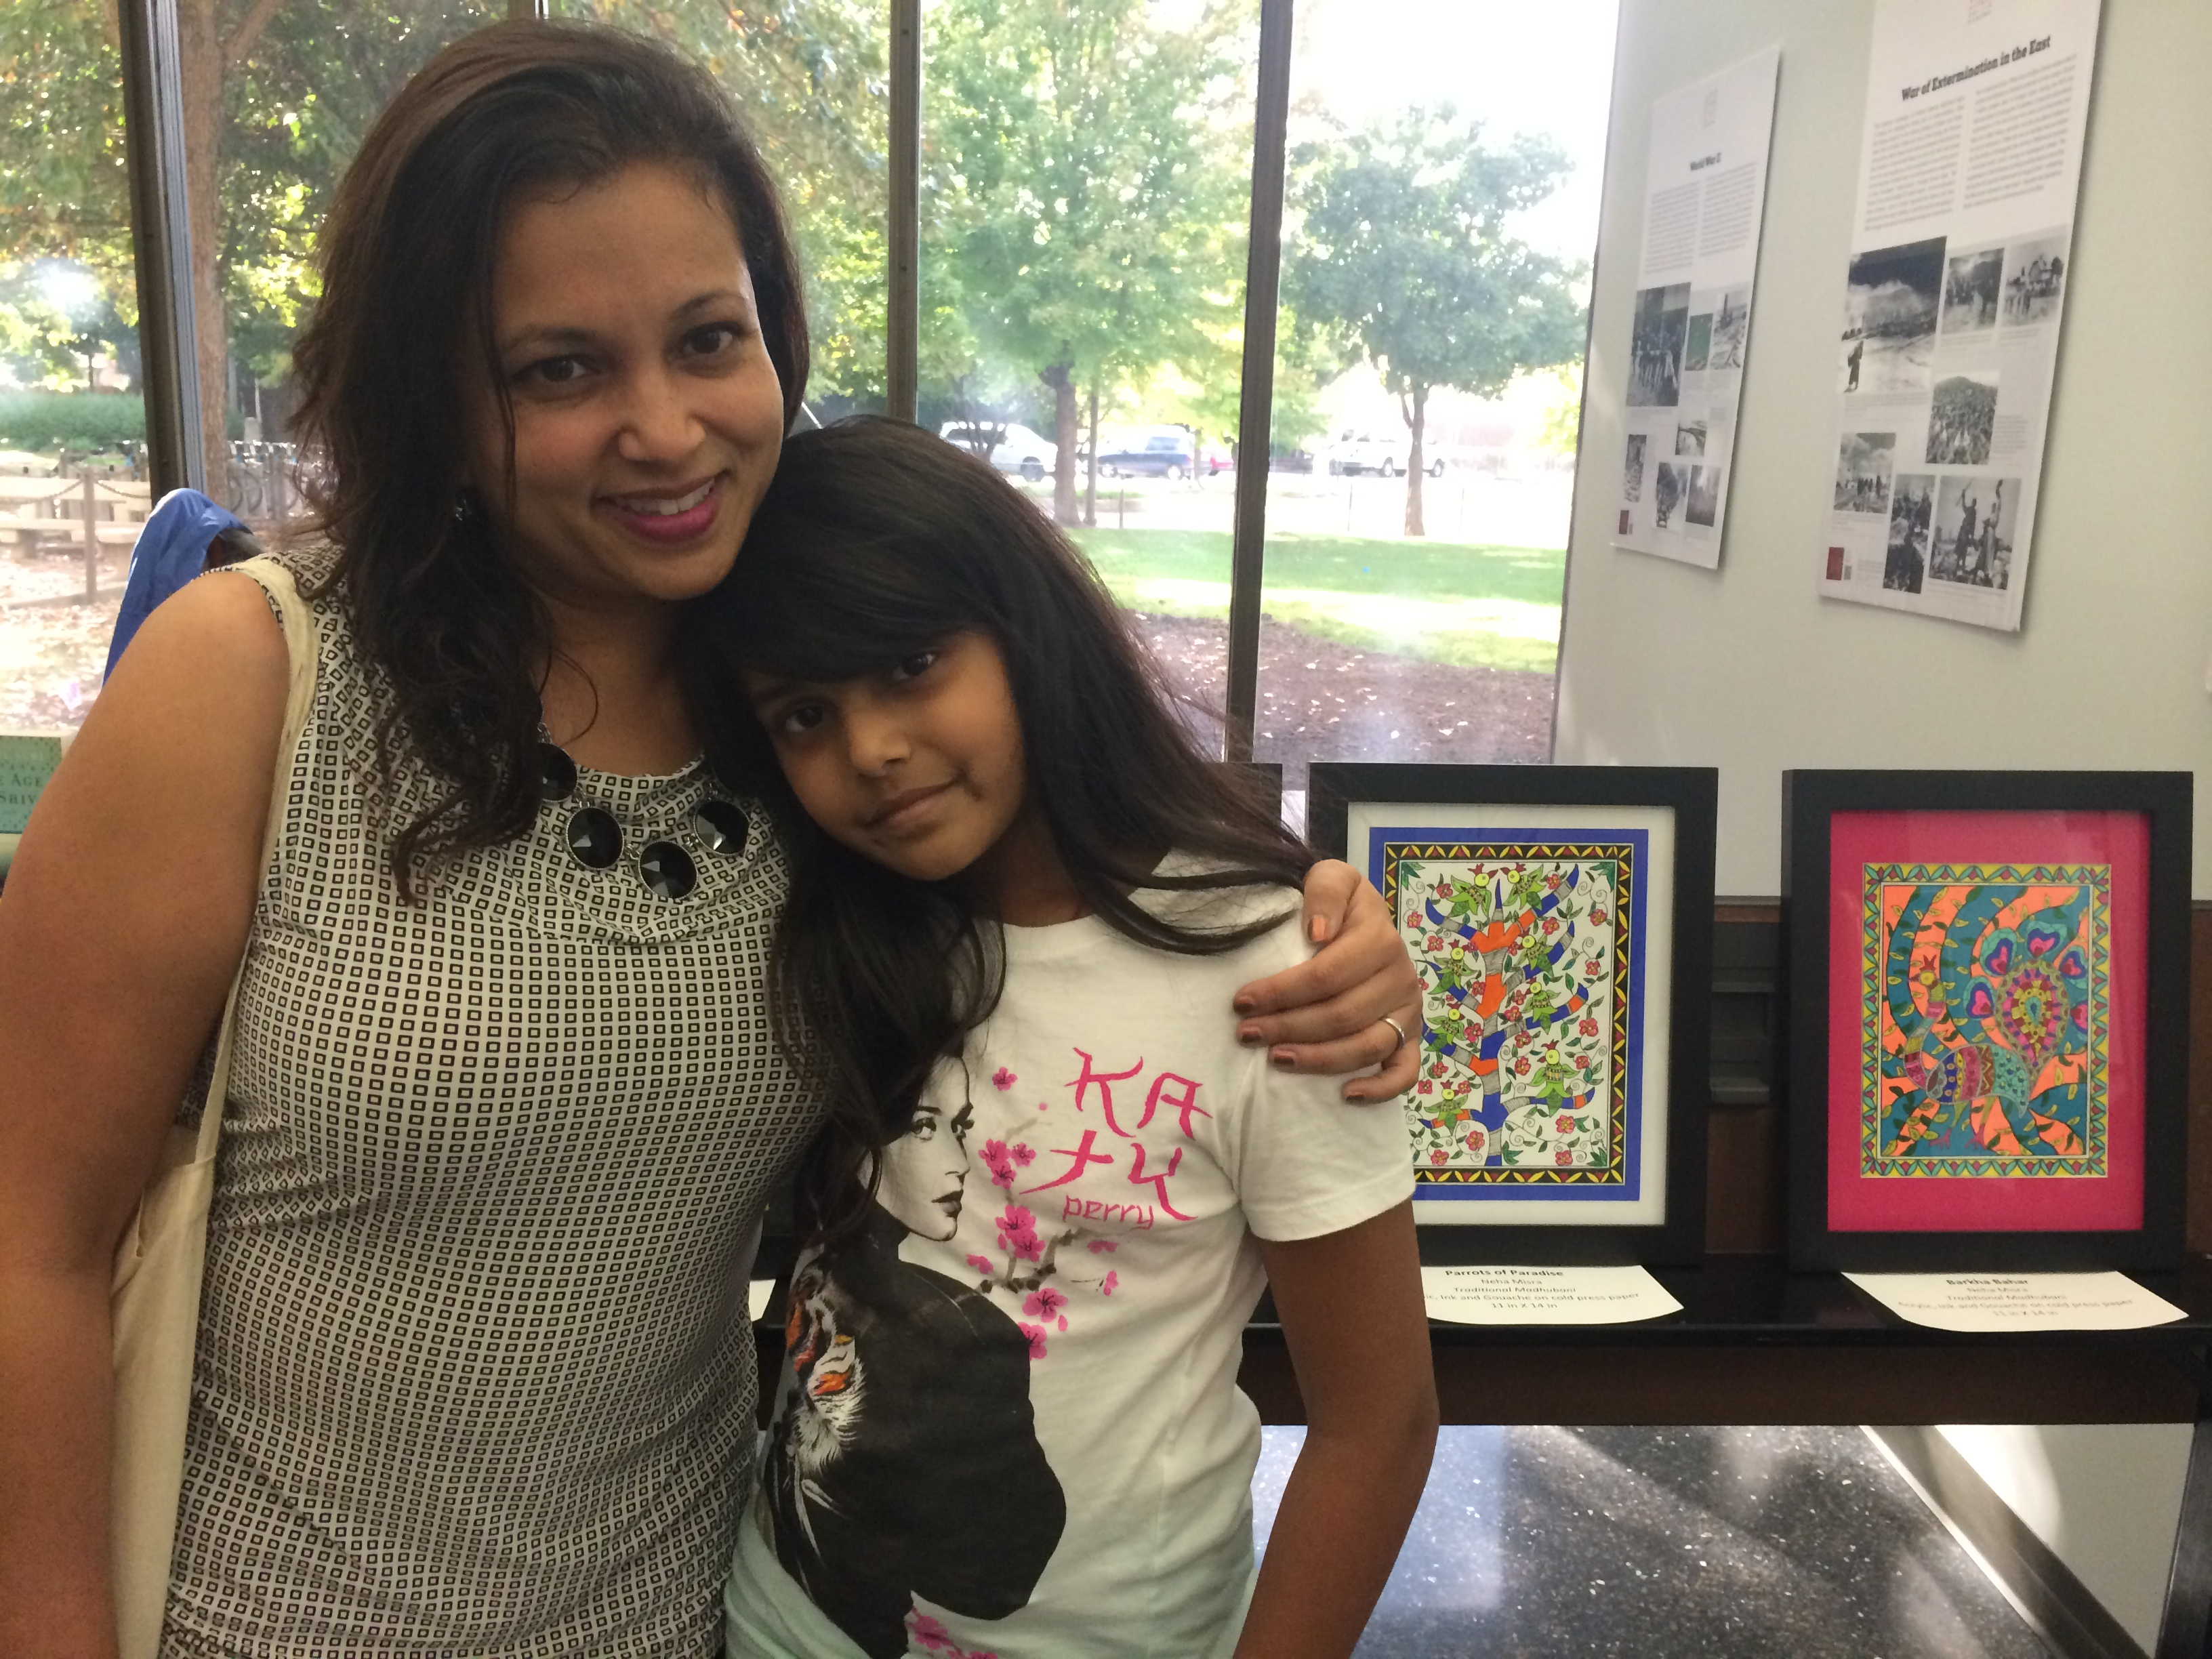 Jaya Hariprasad and her daughter enjoying the festival